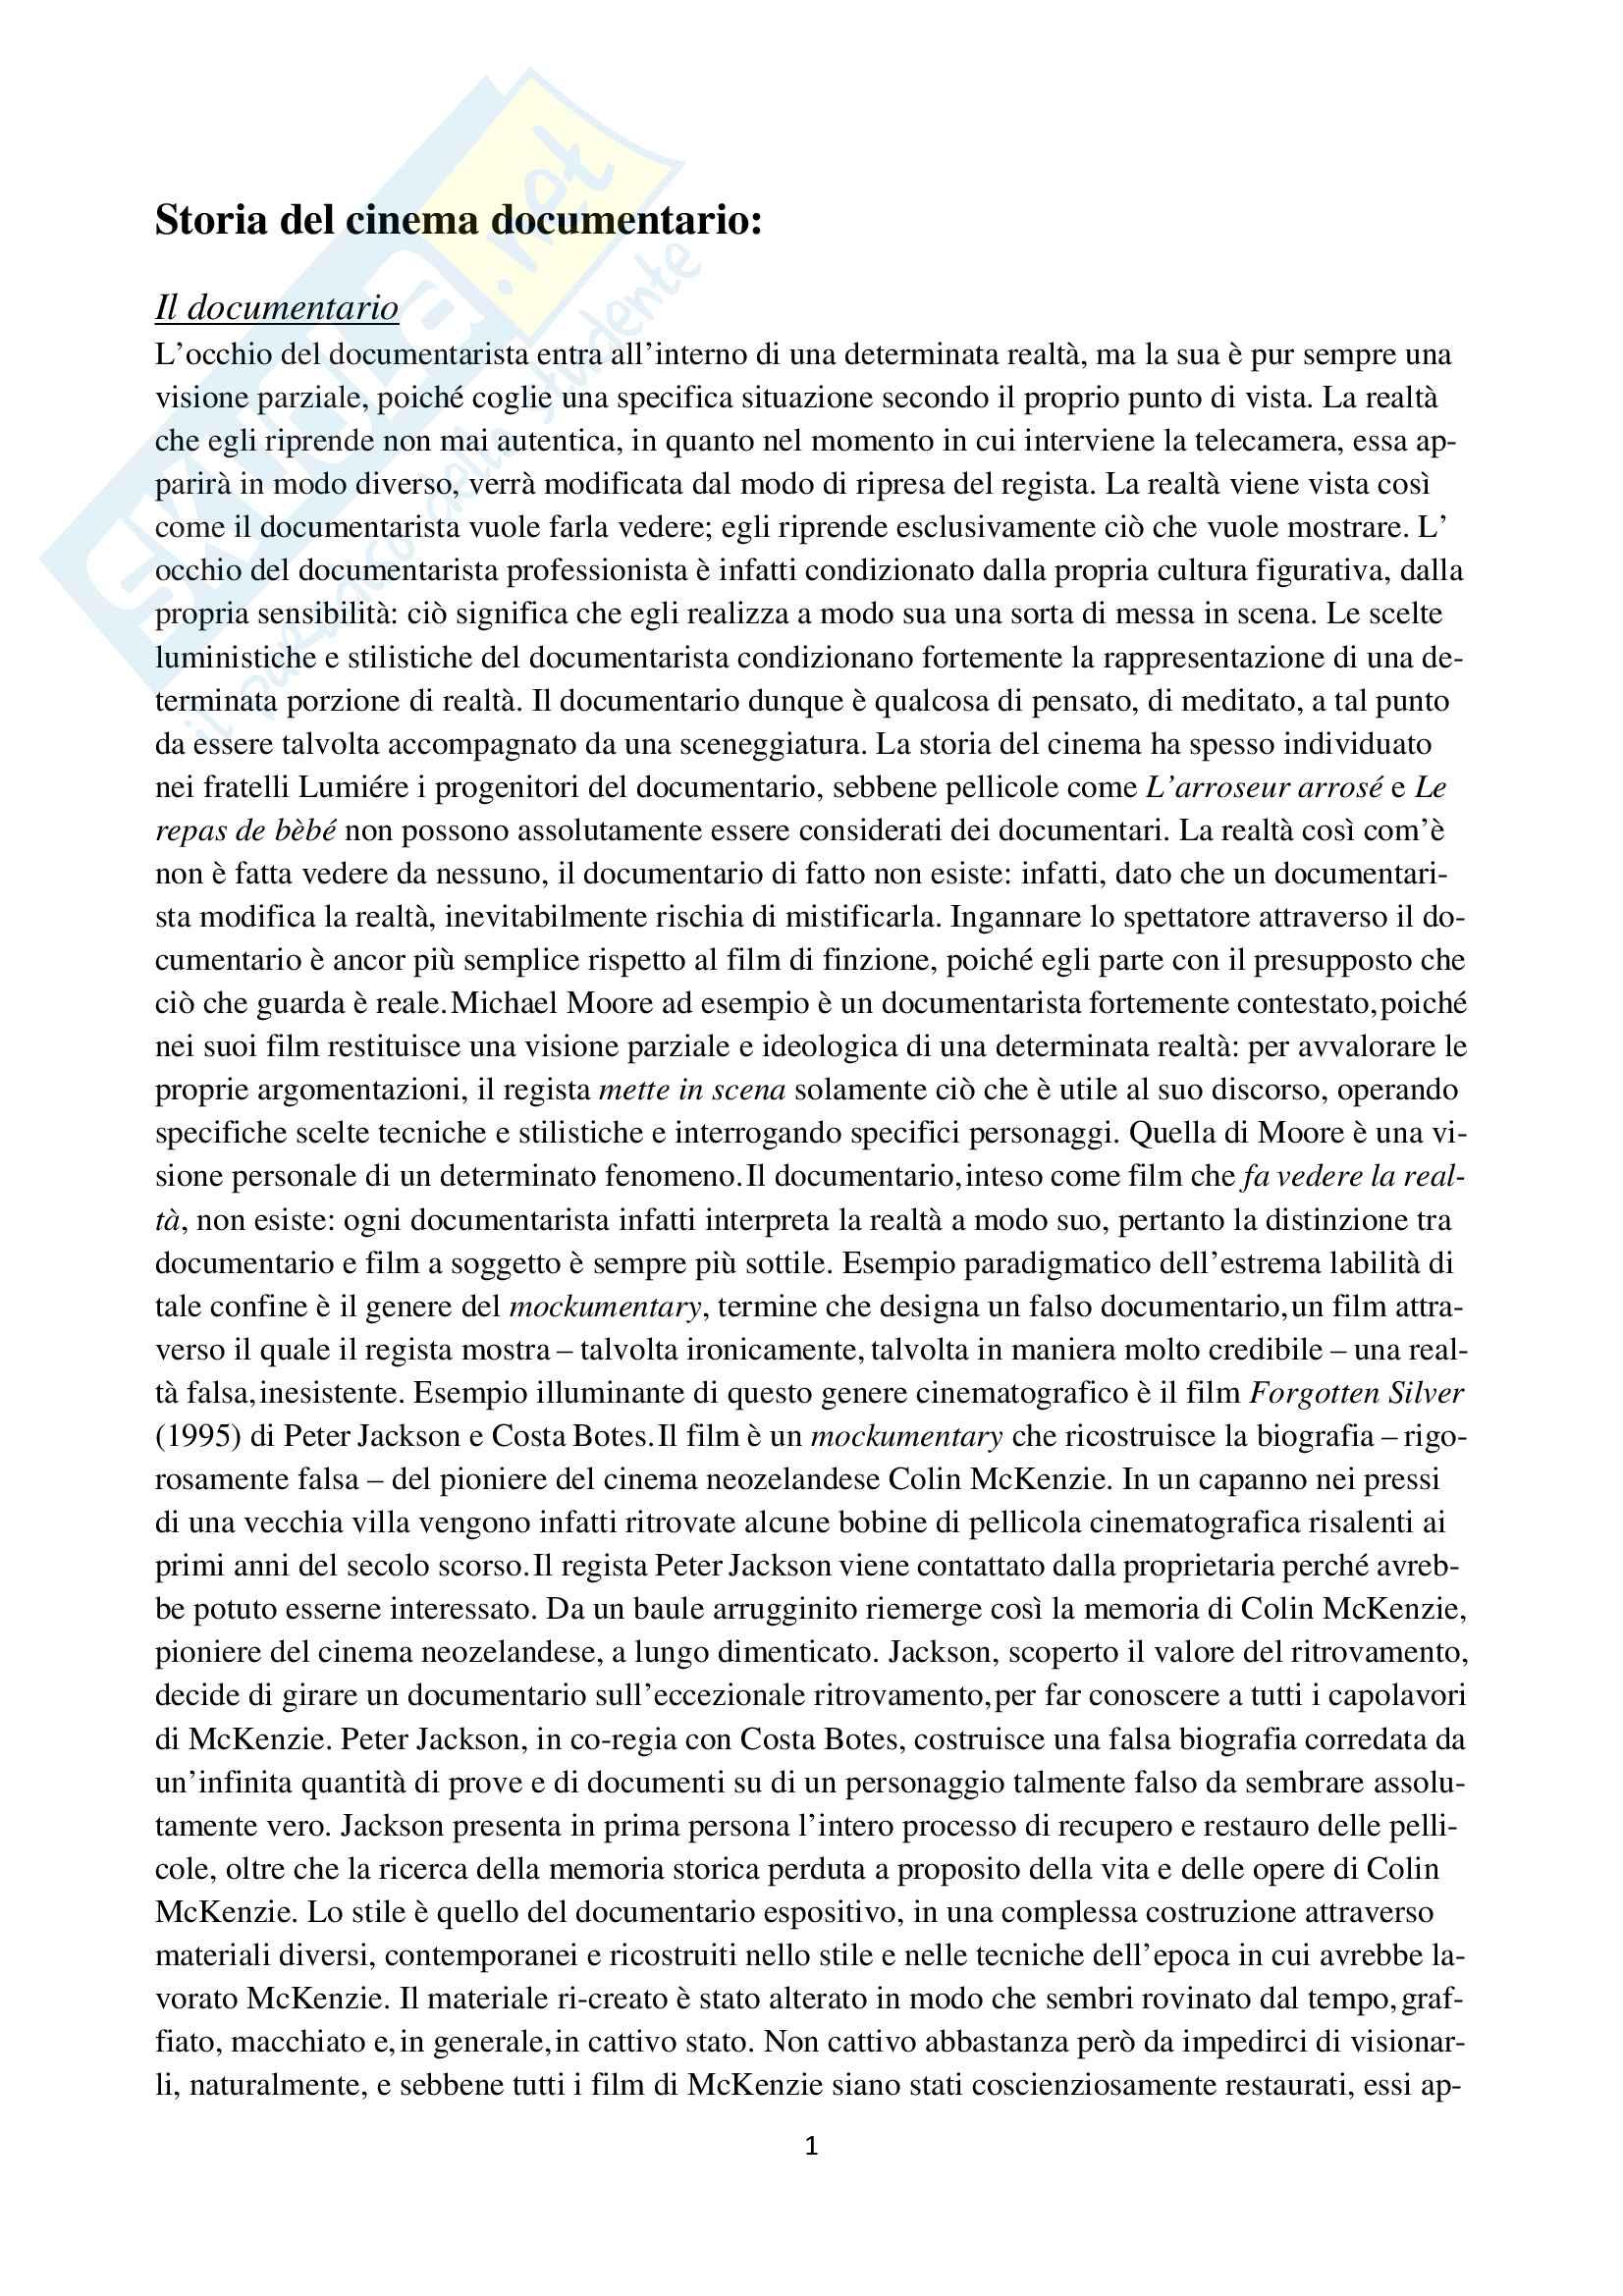 Appunti esame Storia del cinema documentario, prof. Prono